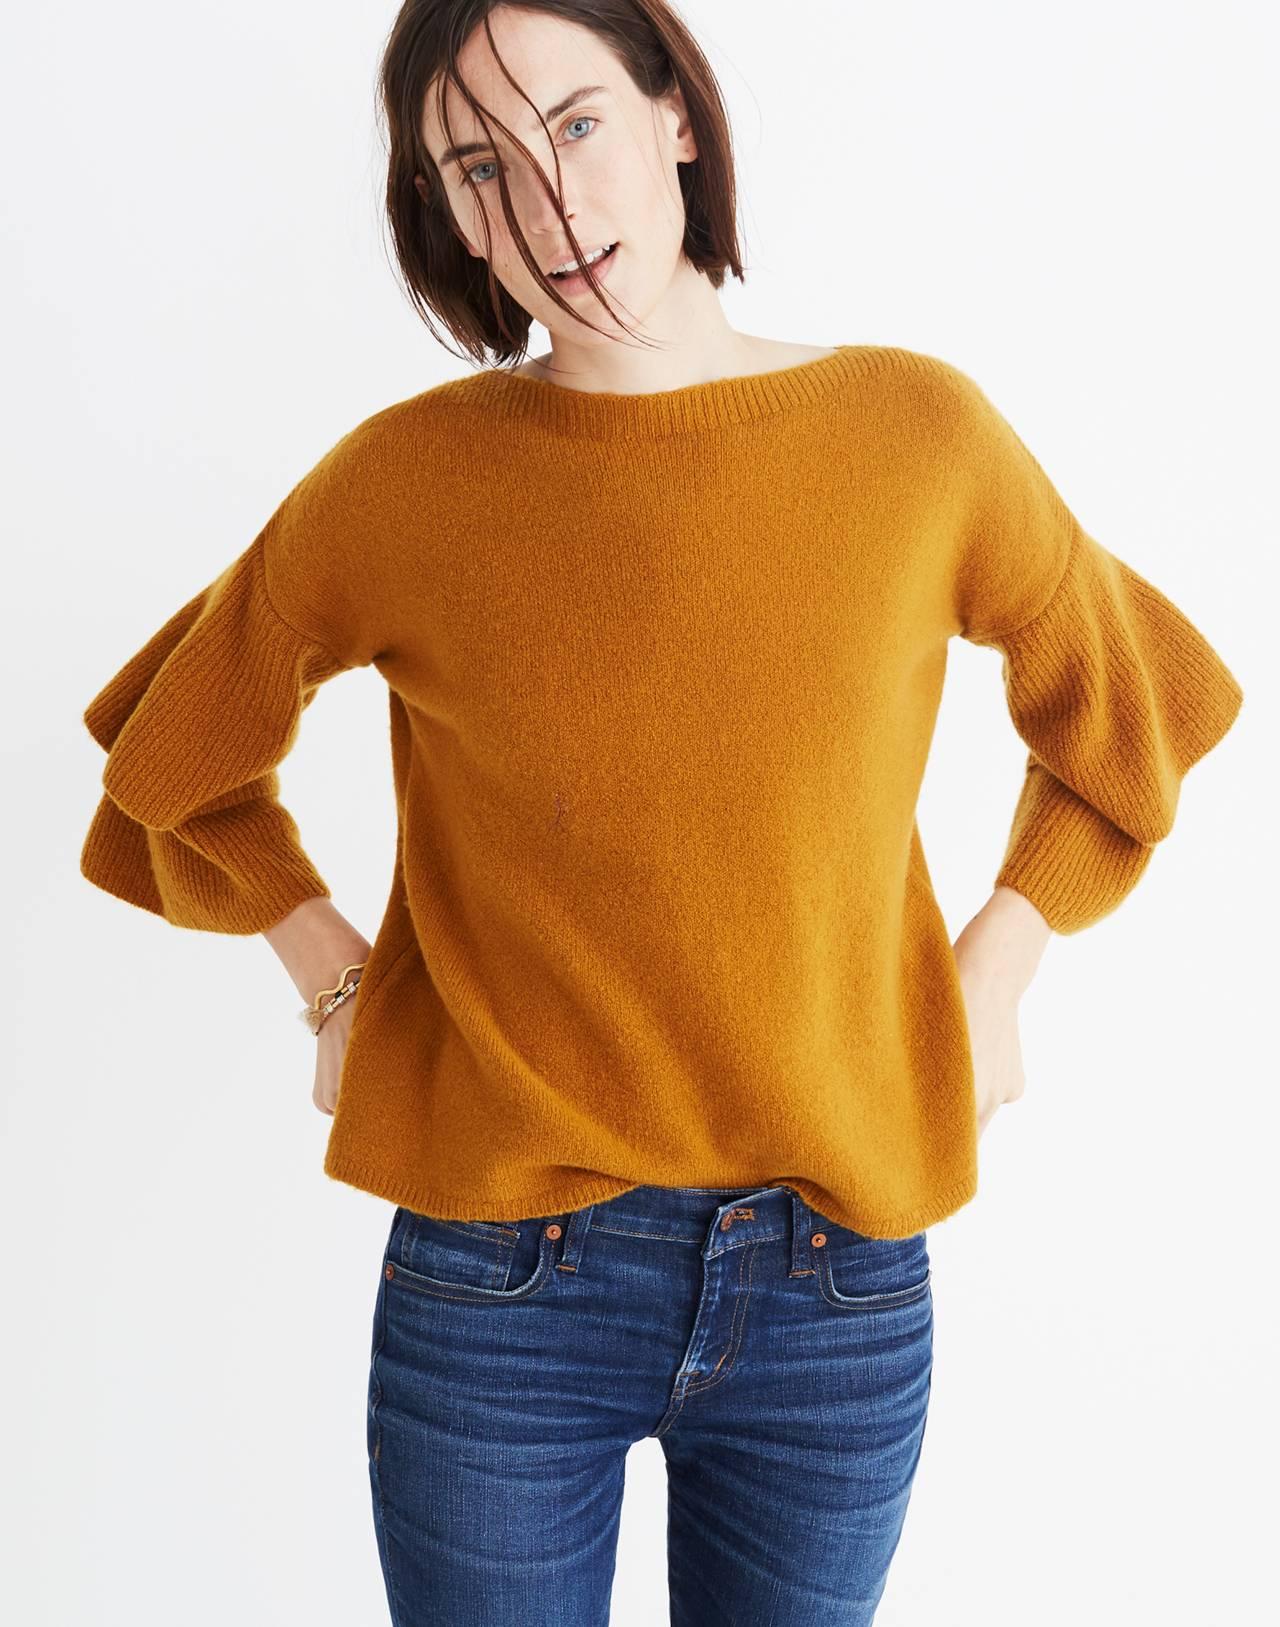 Tier-Sleeve Pullover Sweater in Coziest Yarn in golden harvest image 3